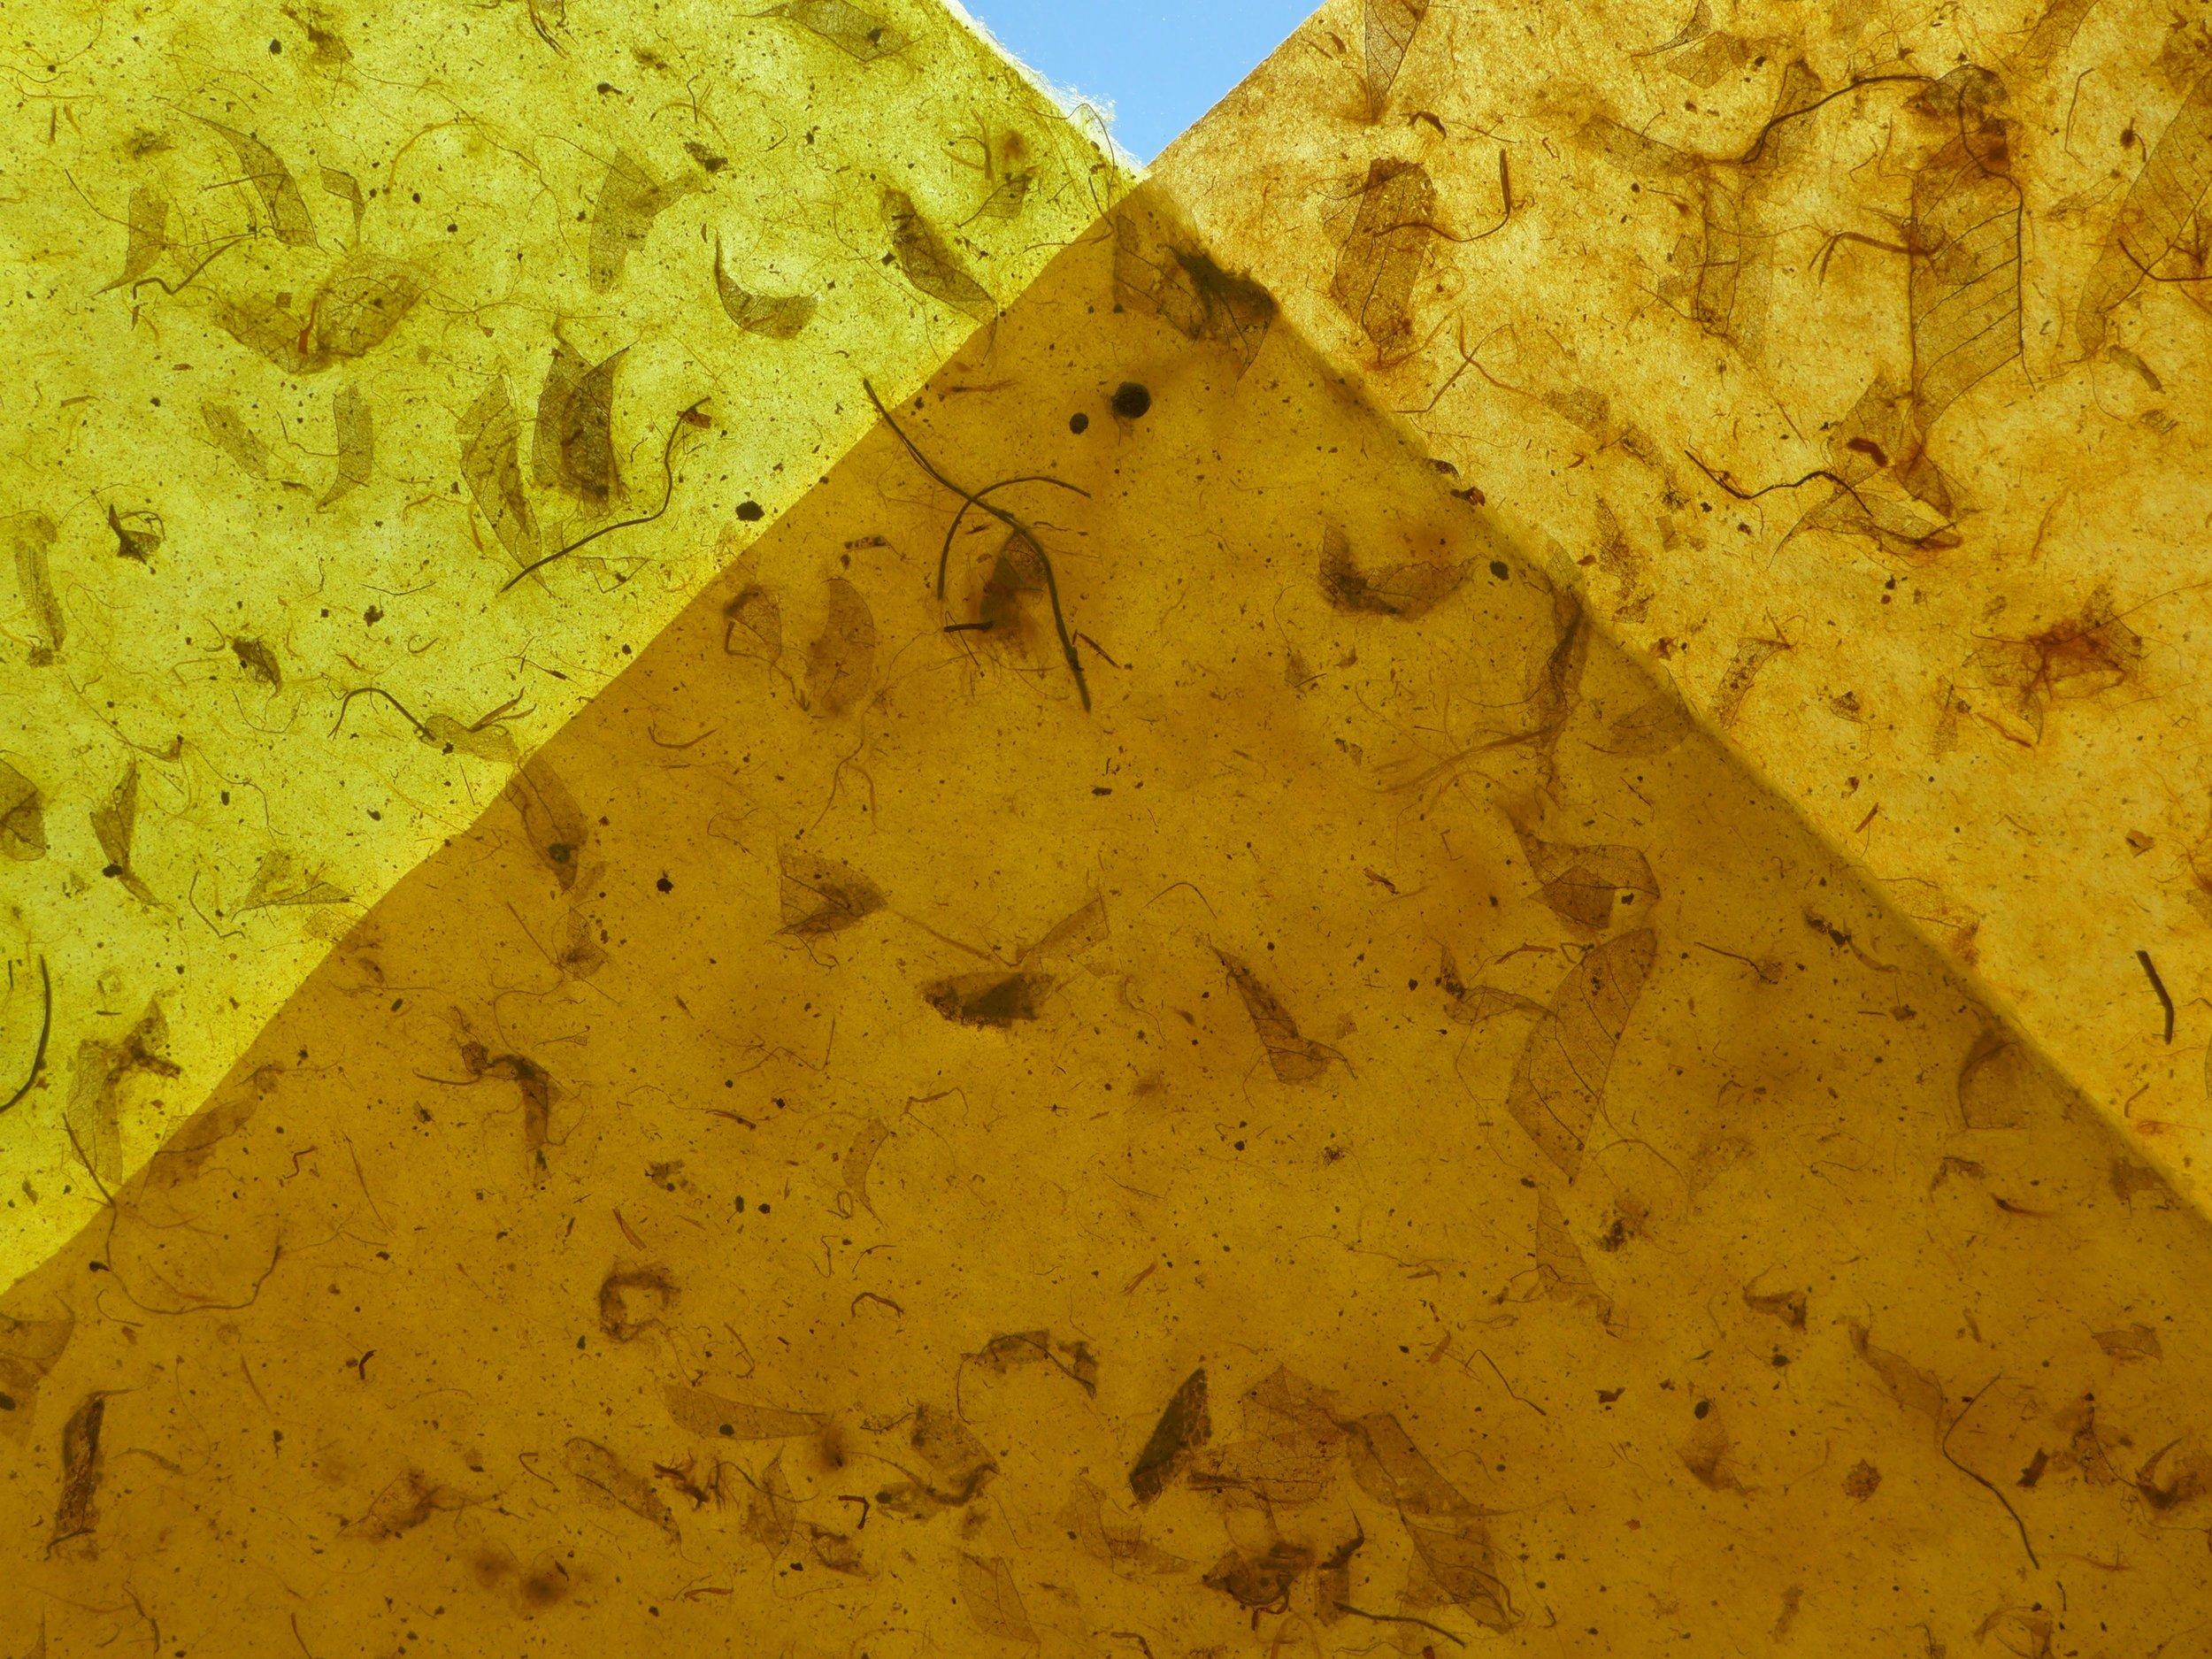 yellow orange mango copy.jpg